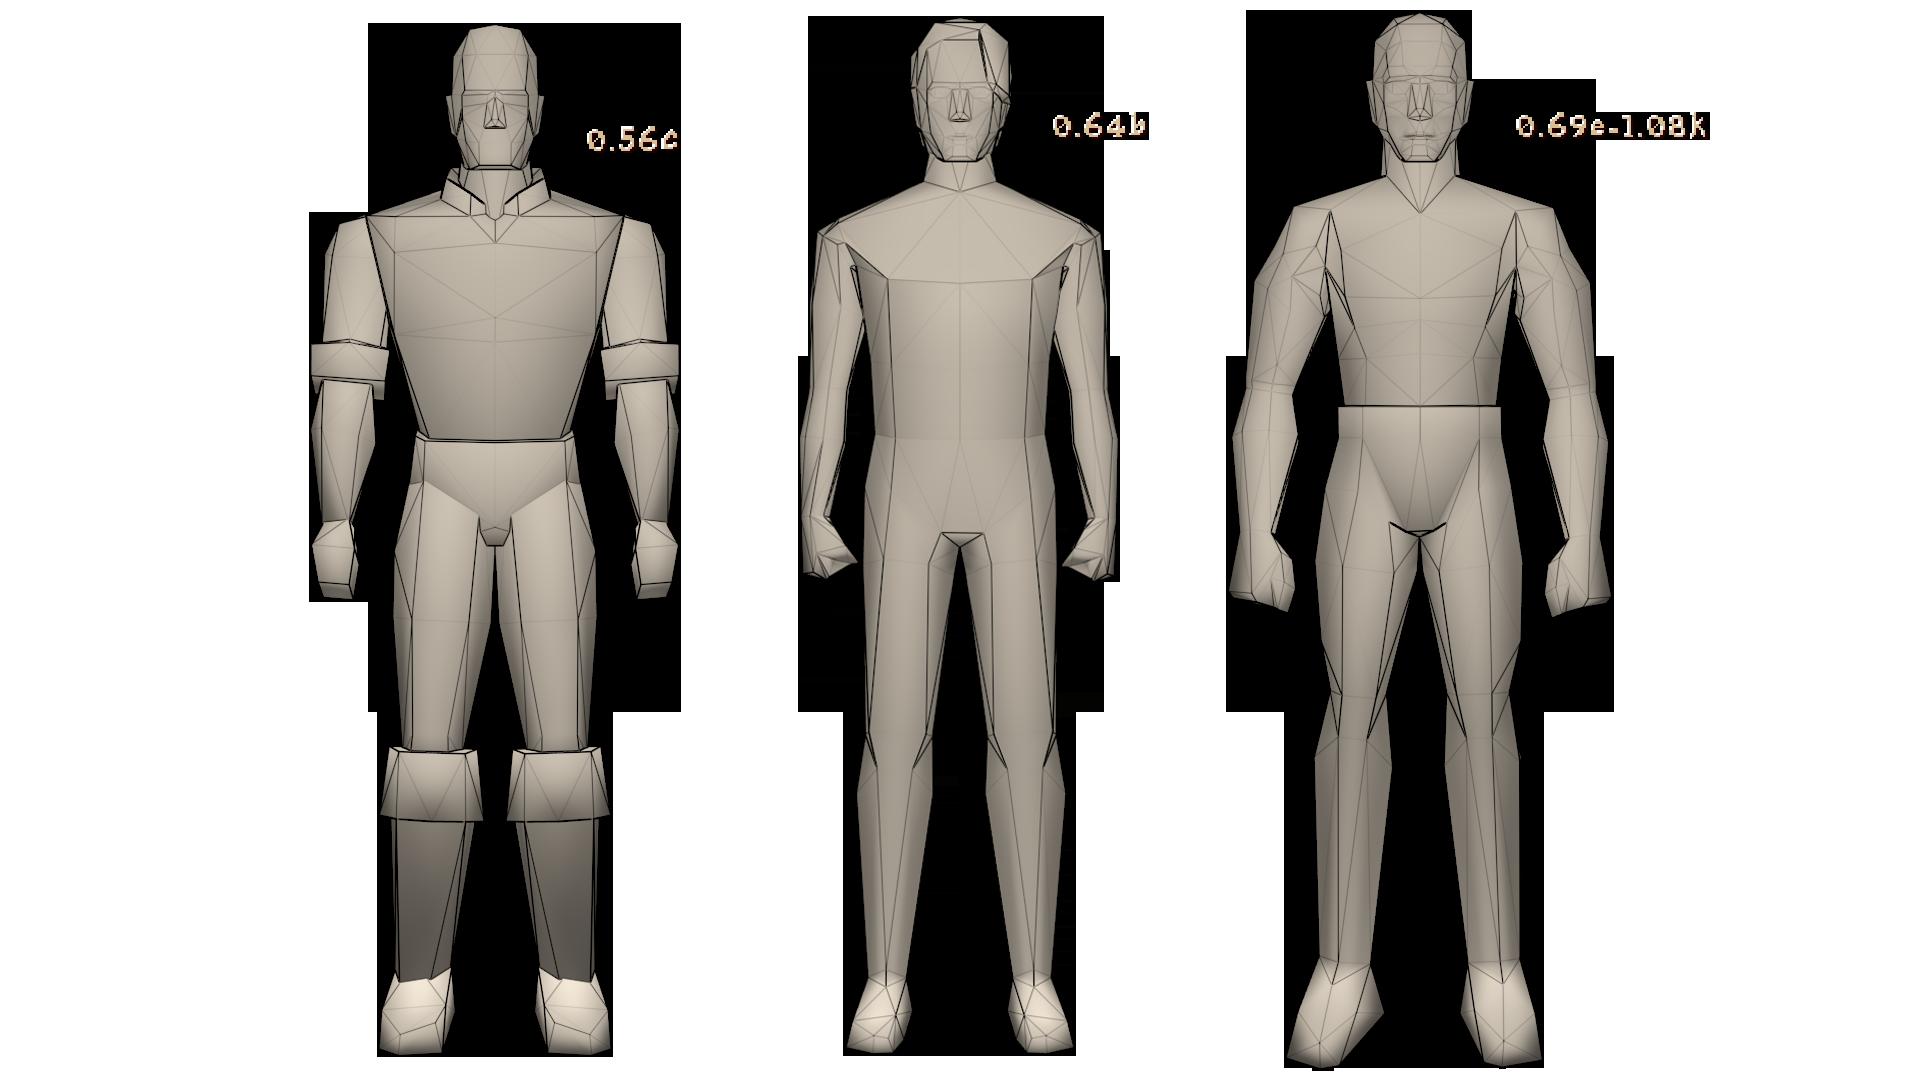 three different body models untextured